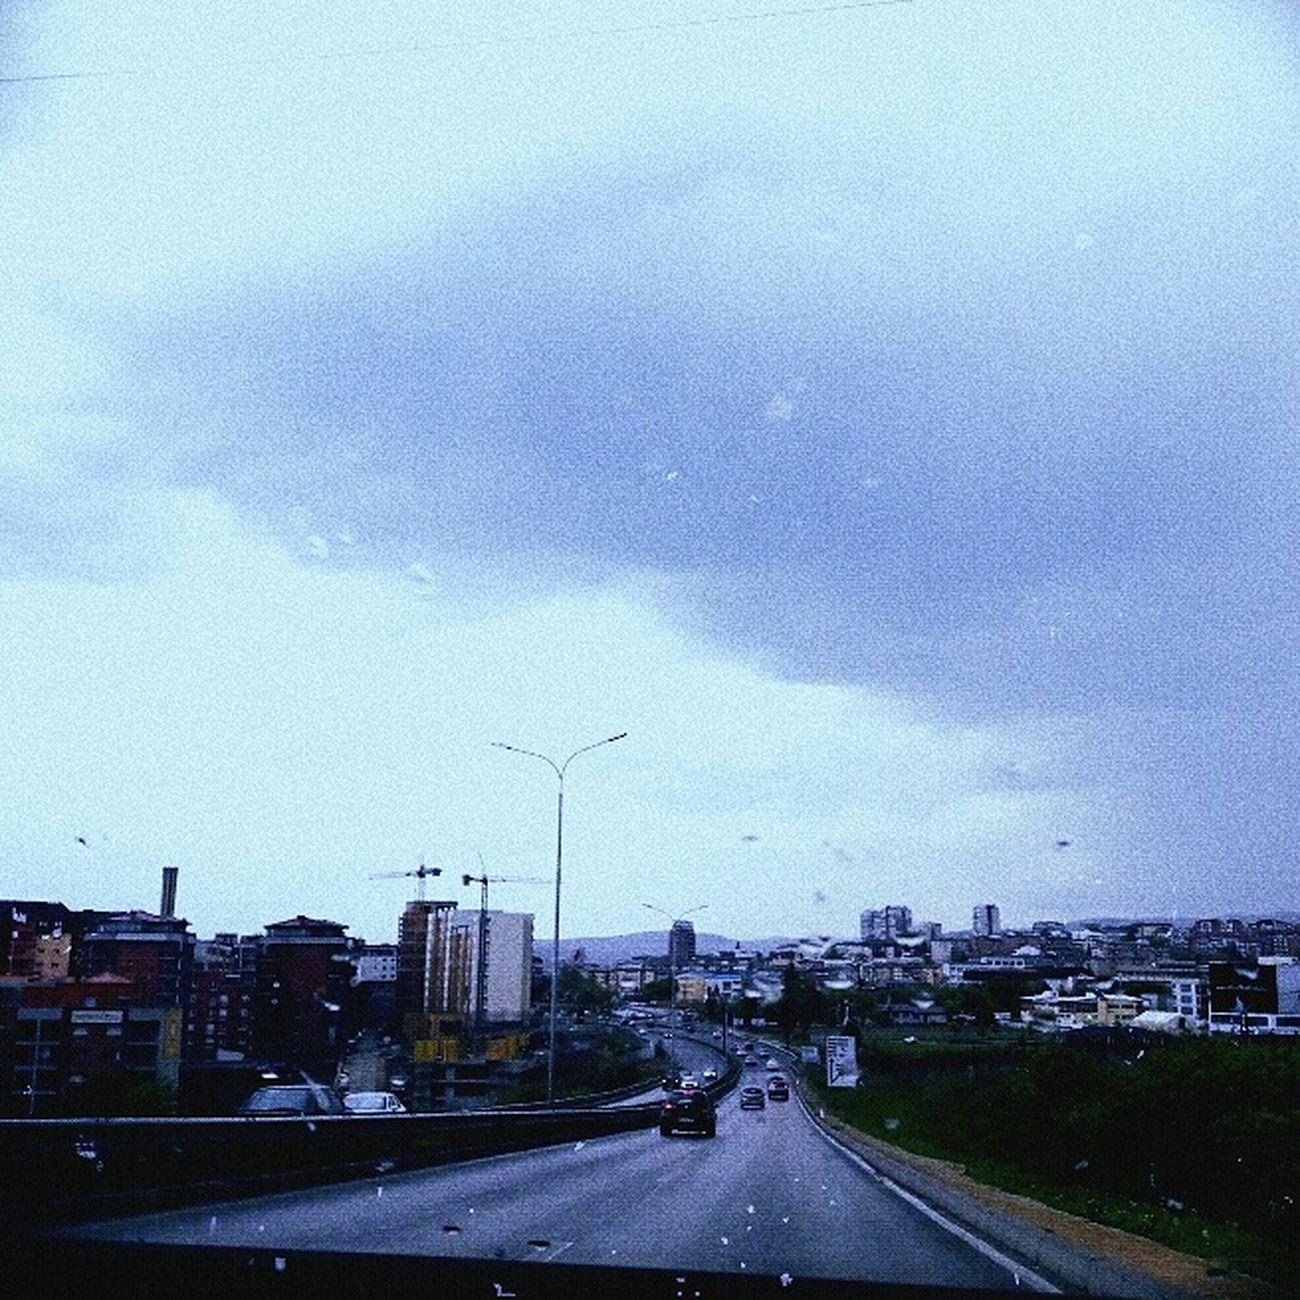 Raindrops Rainymood Road